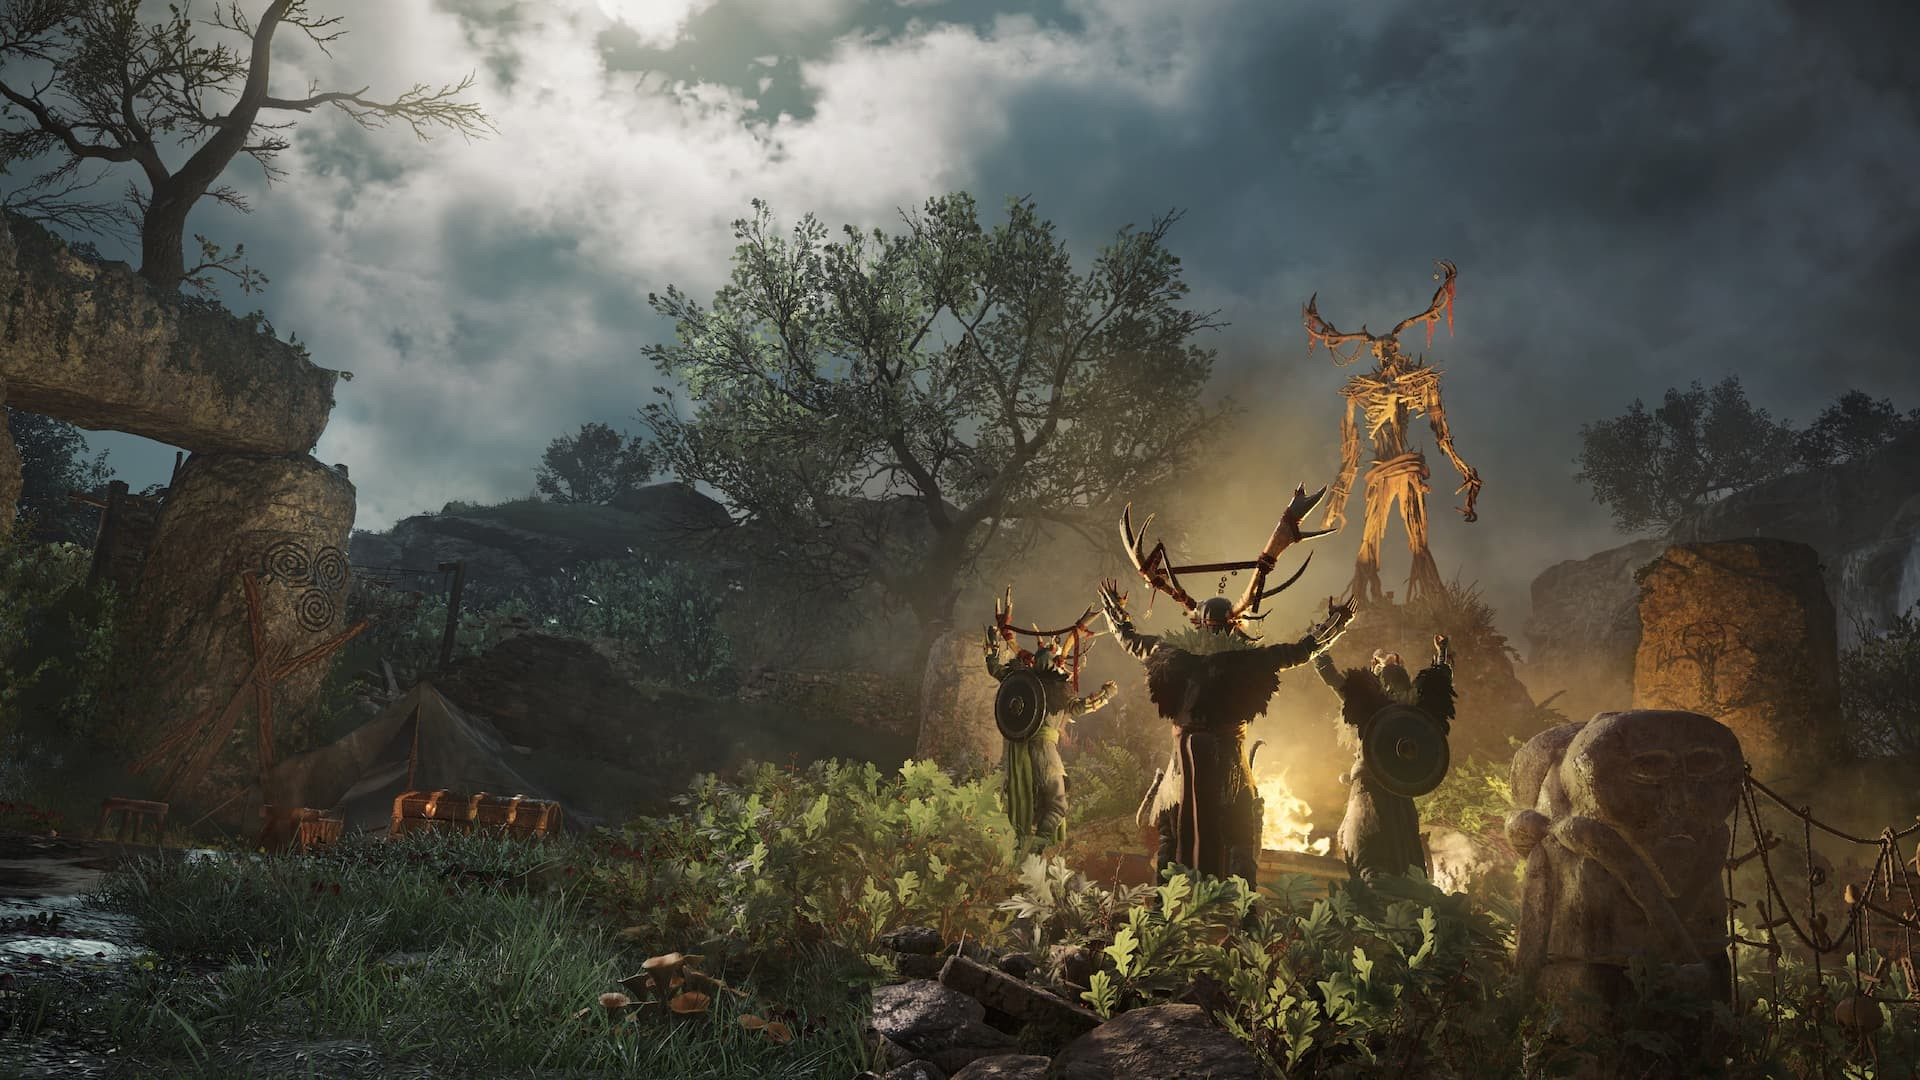 Assassin's Creed Valhalla cerimonia dei druidi